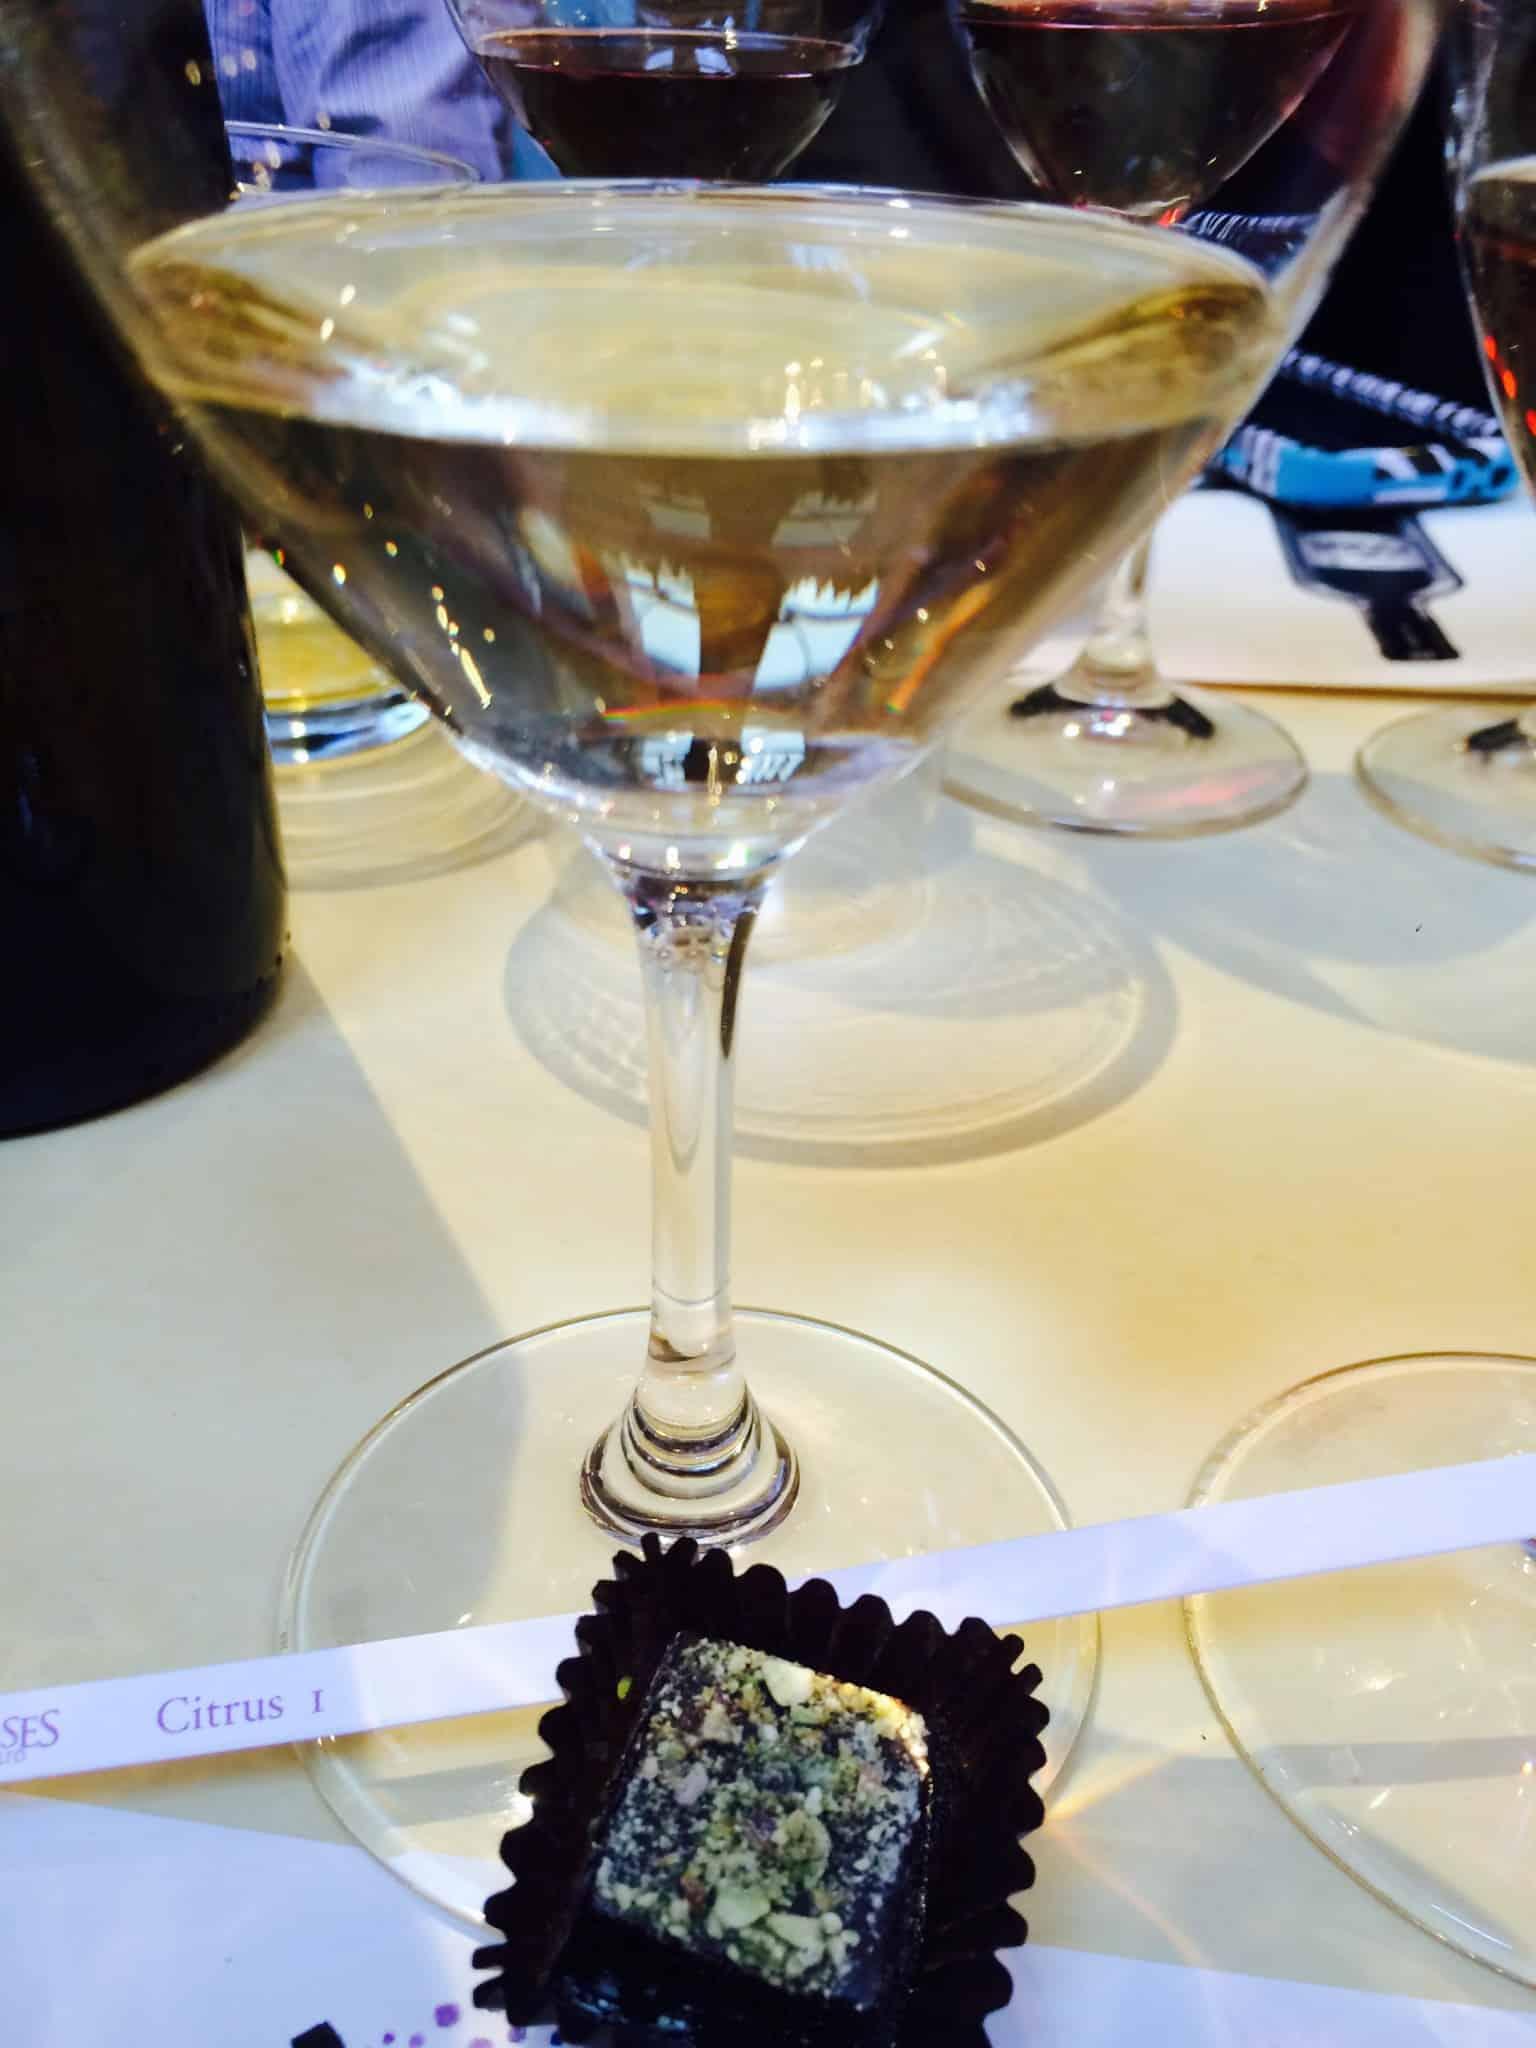 Chocolate: Lemon Pistachio Scent: Citrus Blend Drink: Pajzos Antaloczy Cellars 2012 Furmint Tokaji